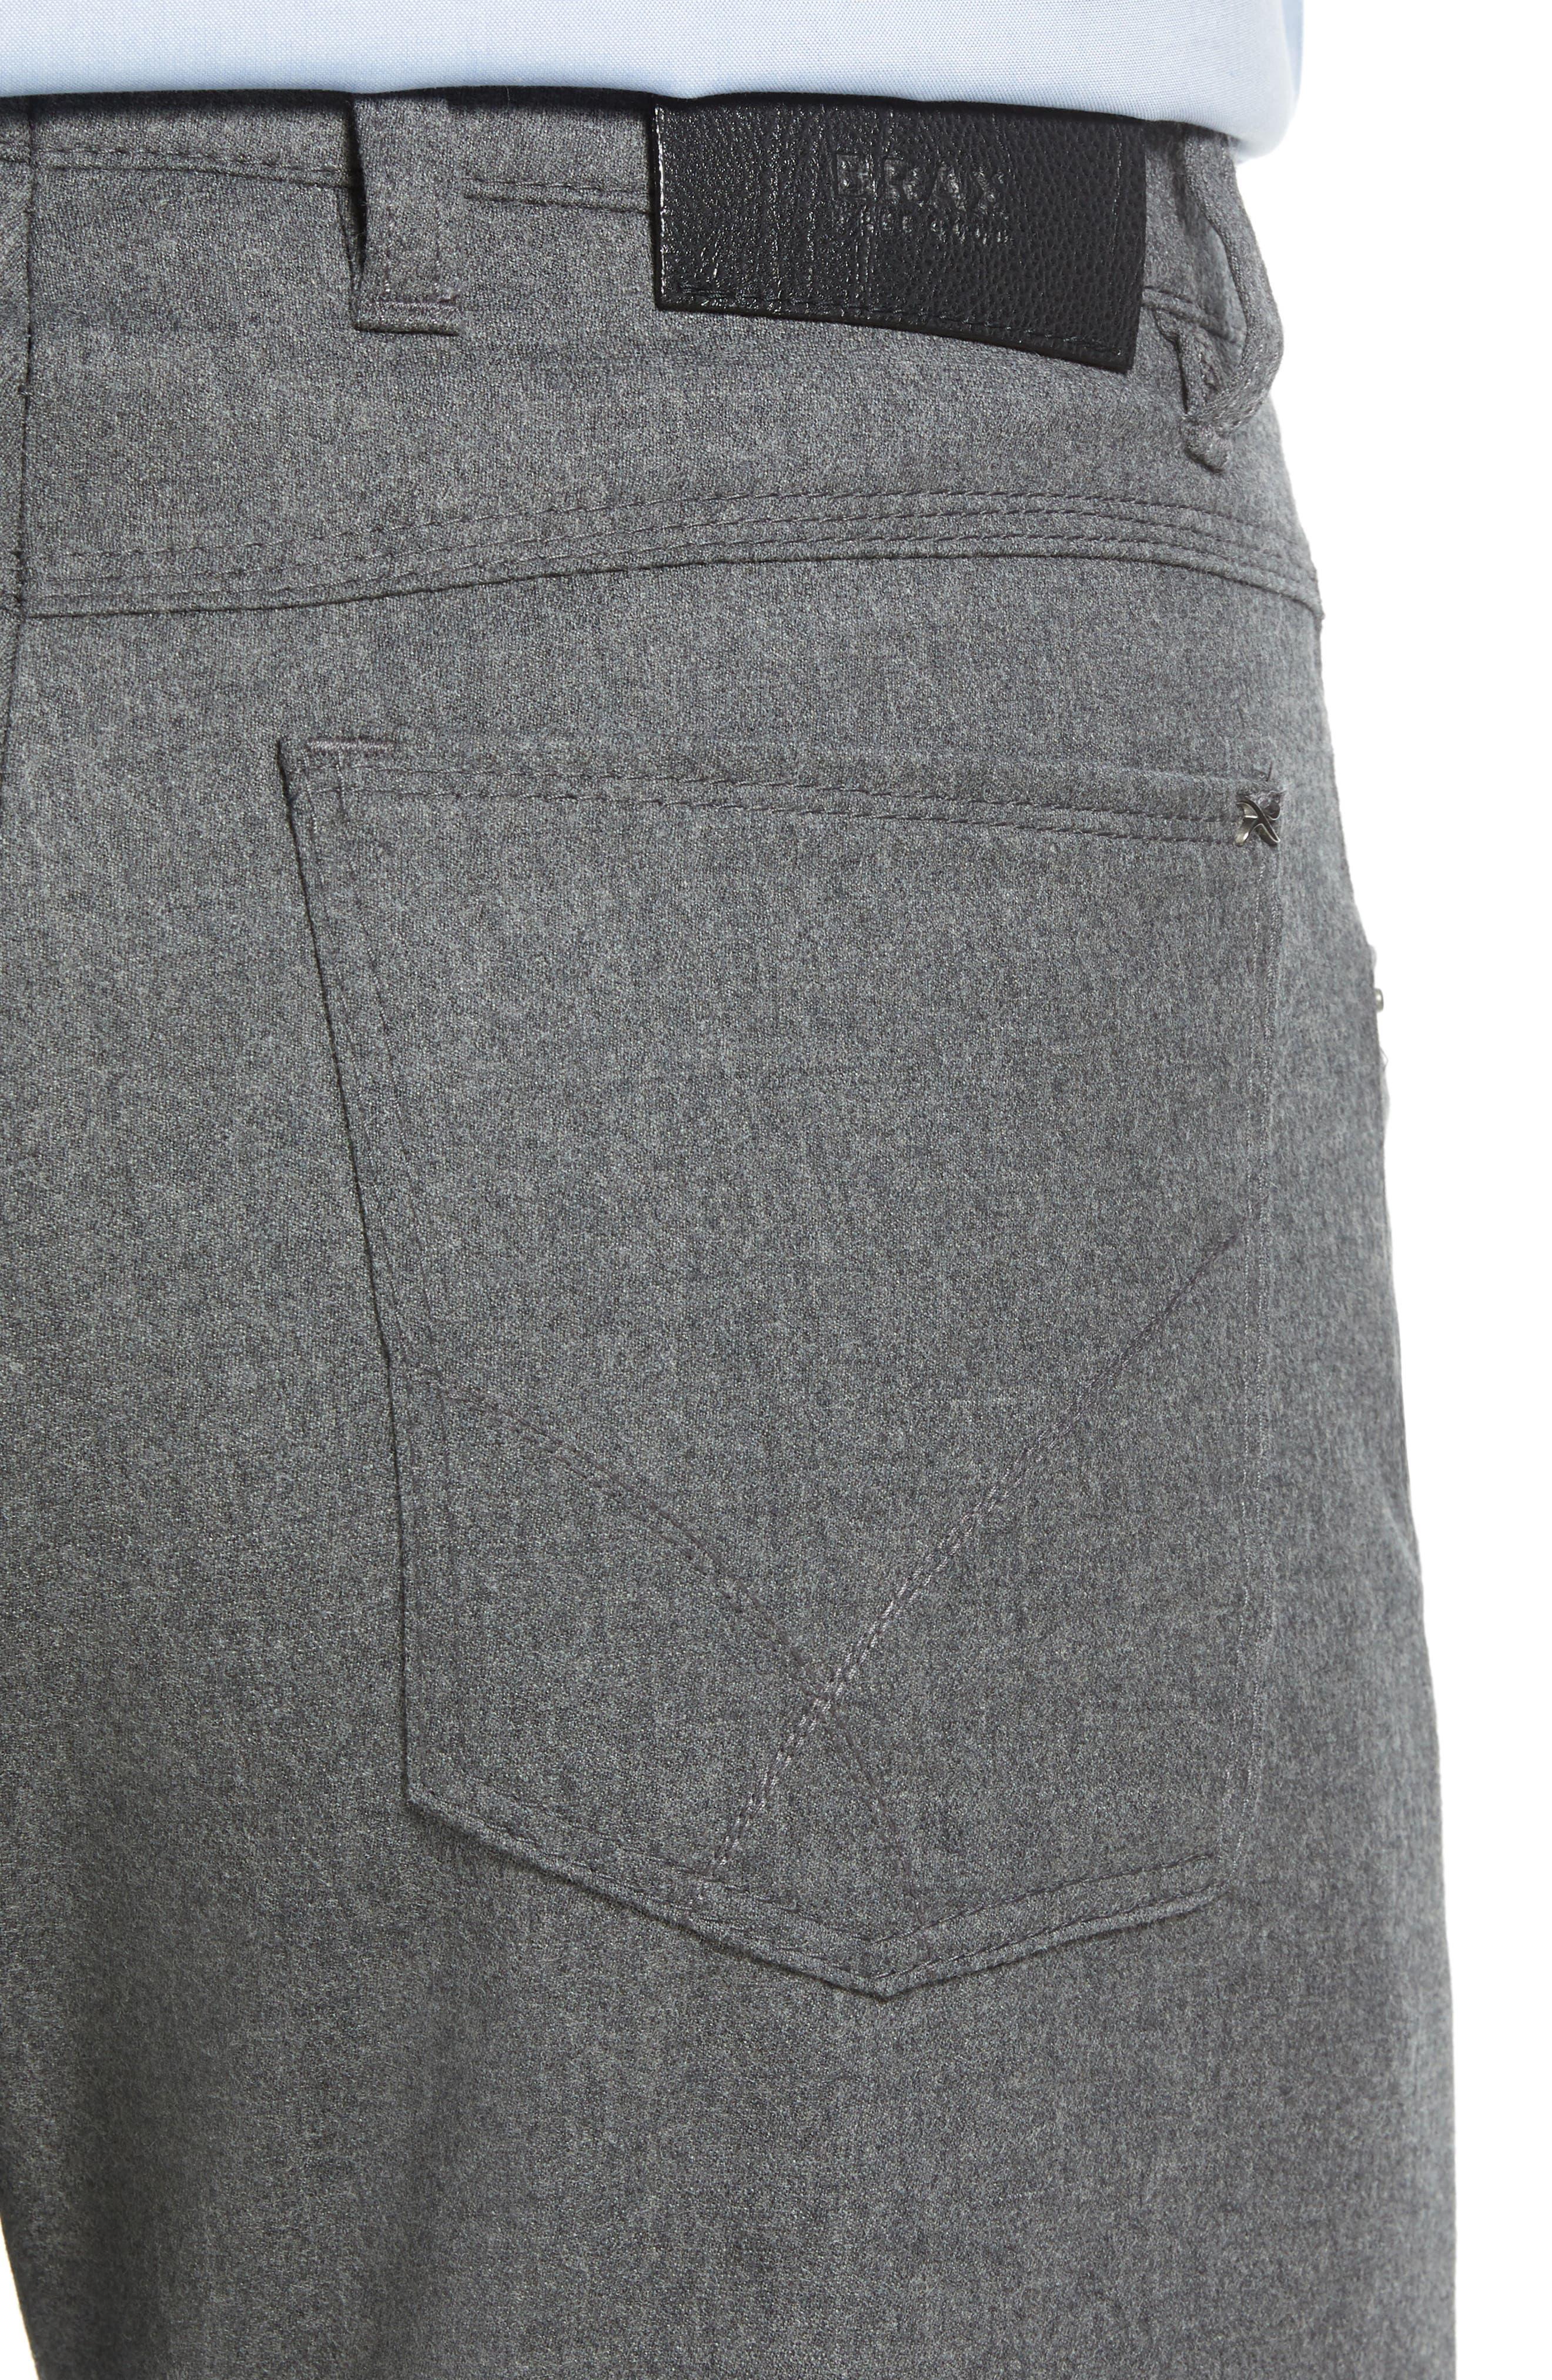 Enrico Five-Pocket Stretch Wool Trousers,                             Alternate thumbnail 4, color,                             GRAPHITE